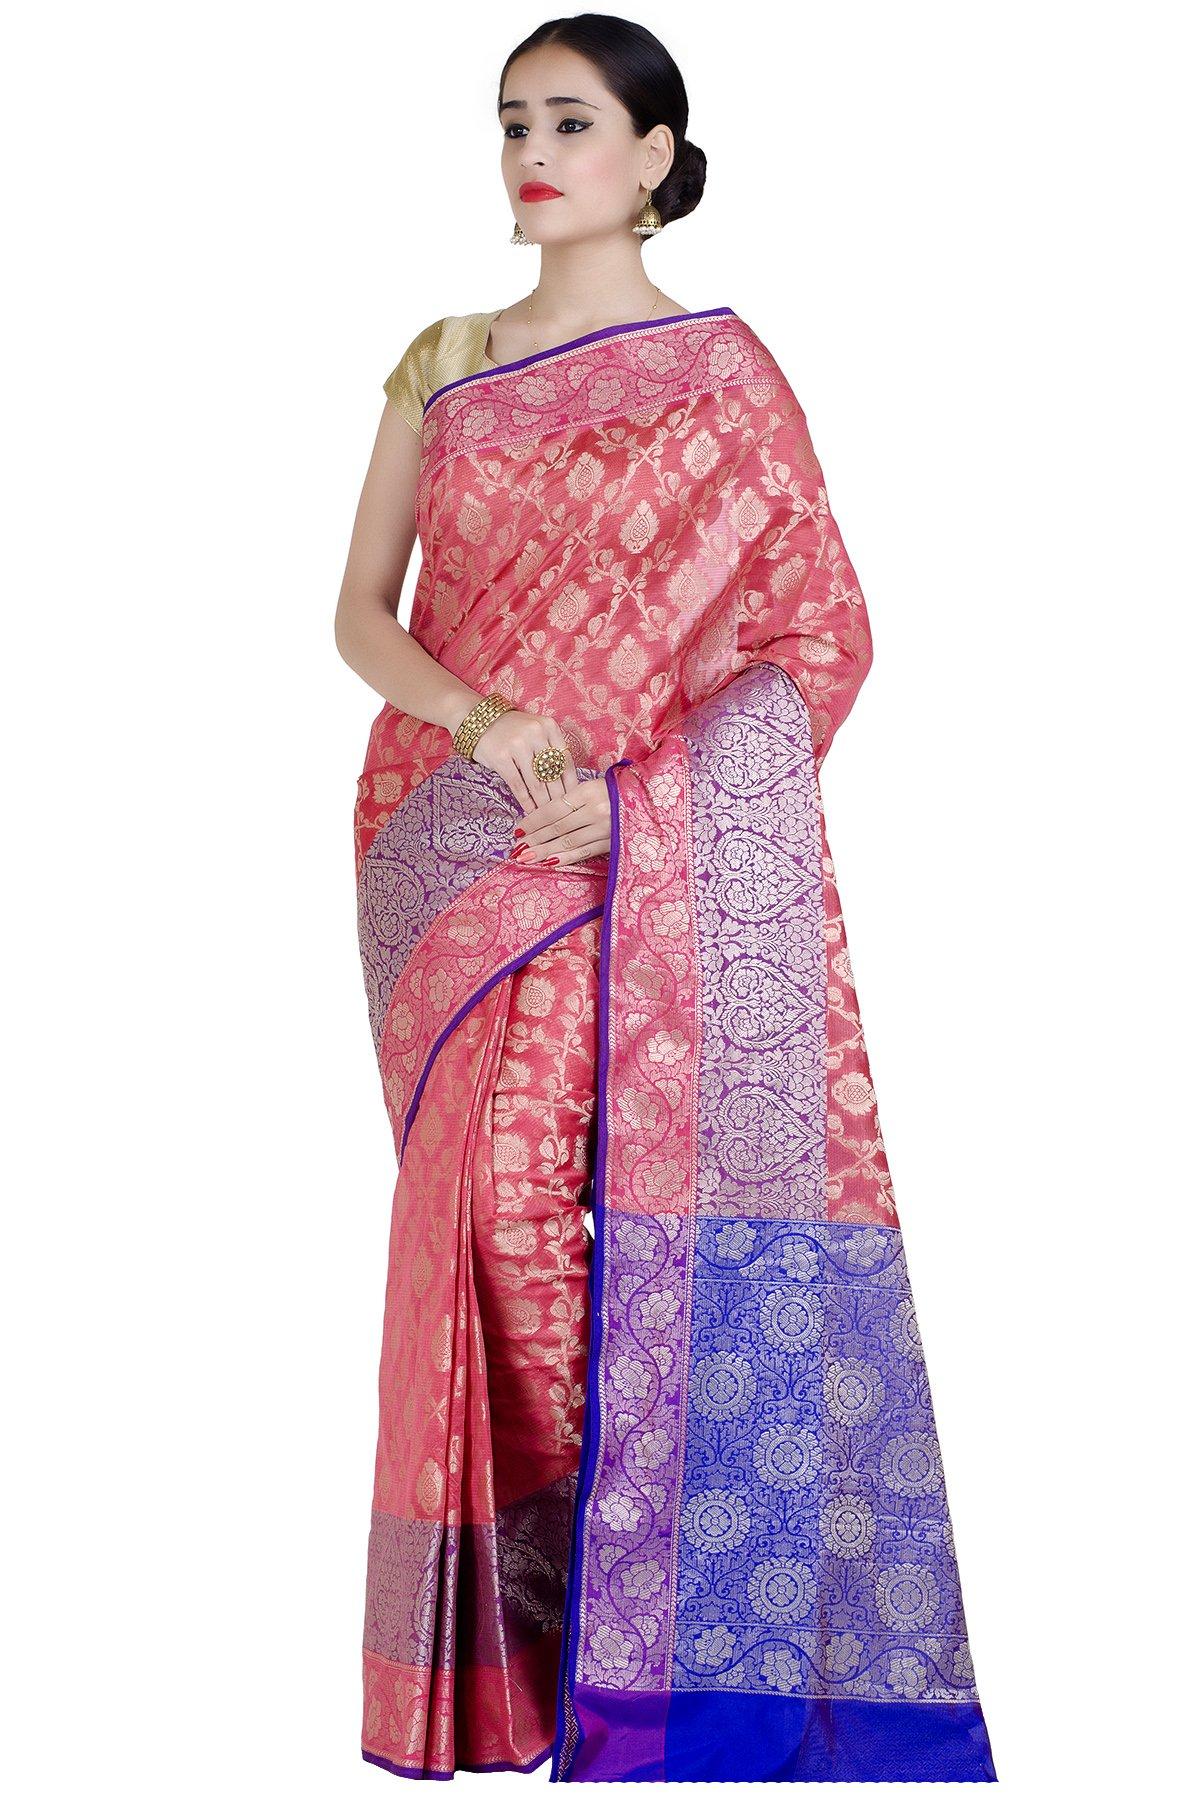 Chandrakala Women's Peach Cotton Silk Banarasi Saree(1291PEA)